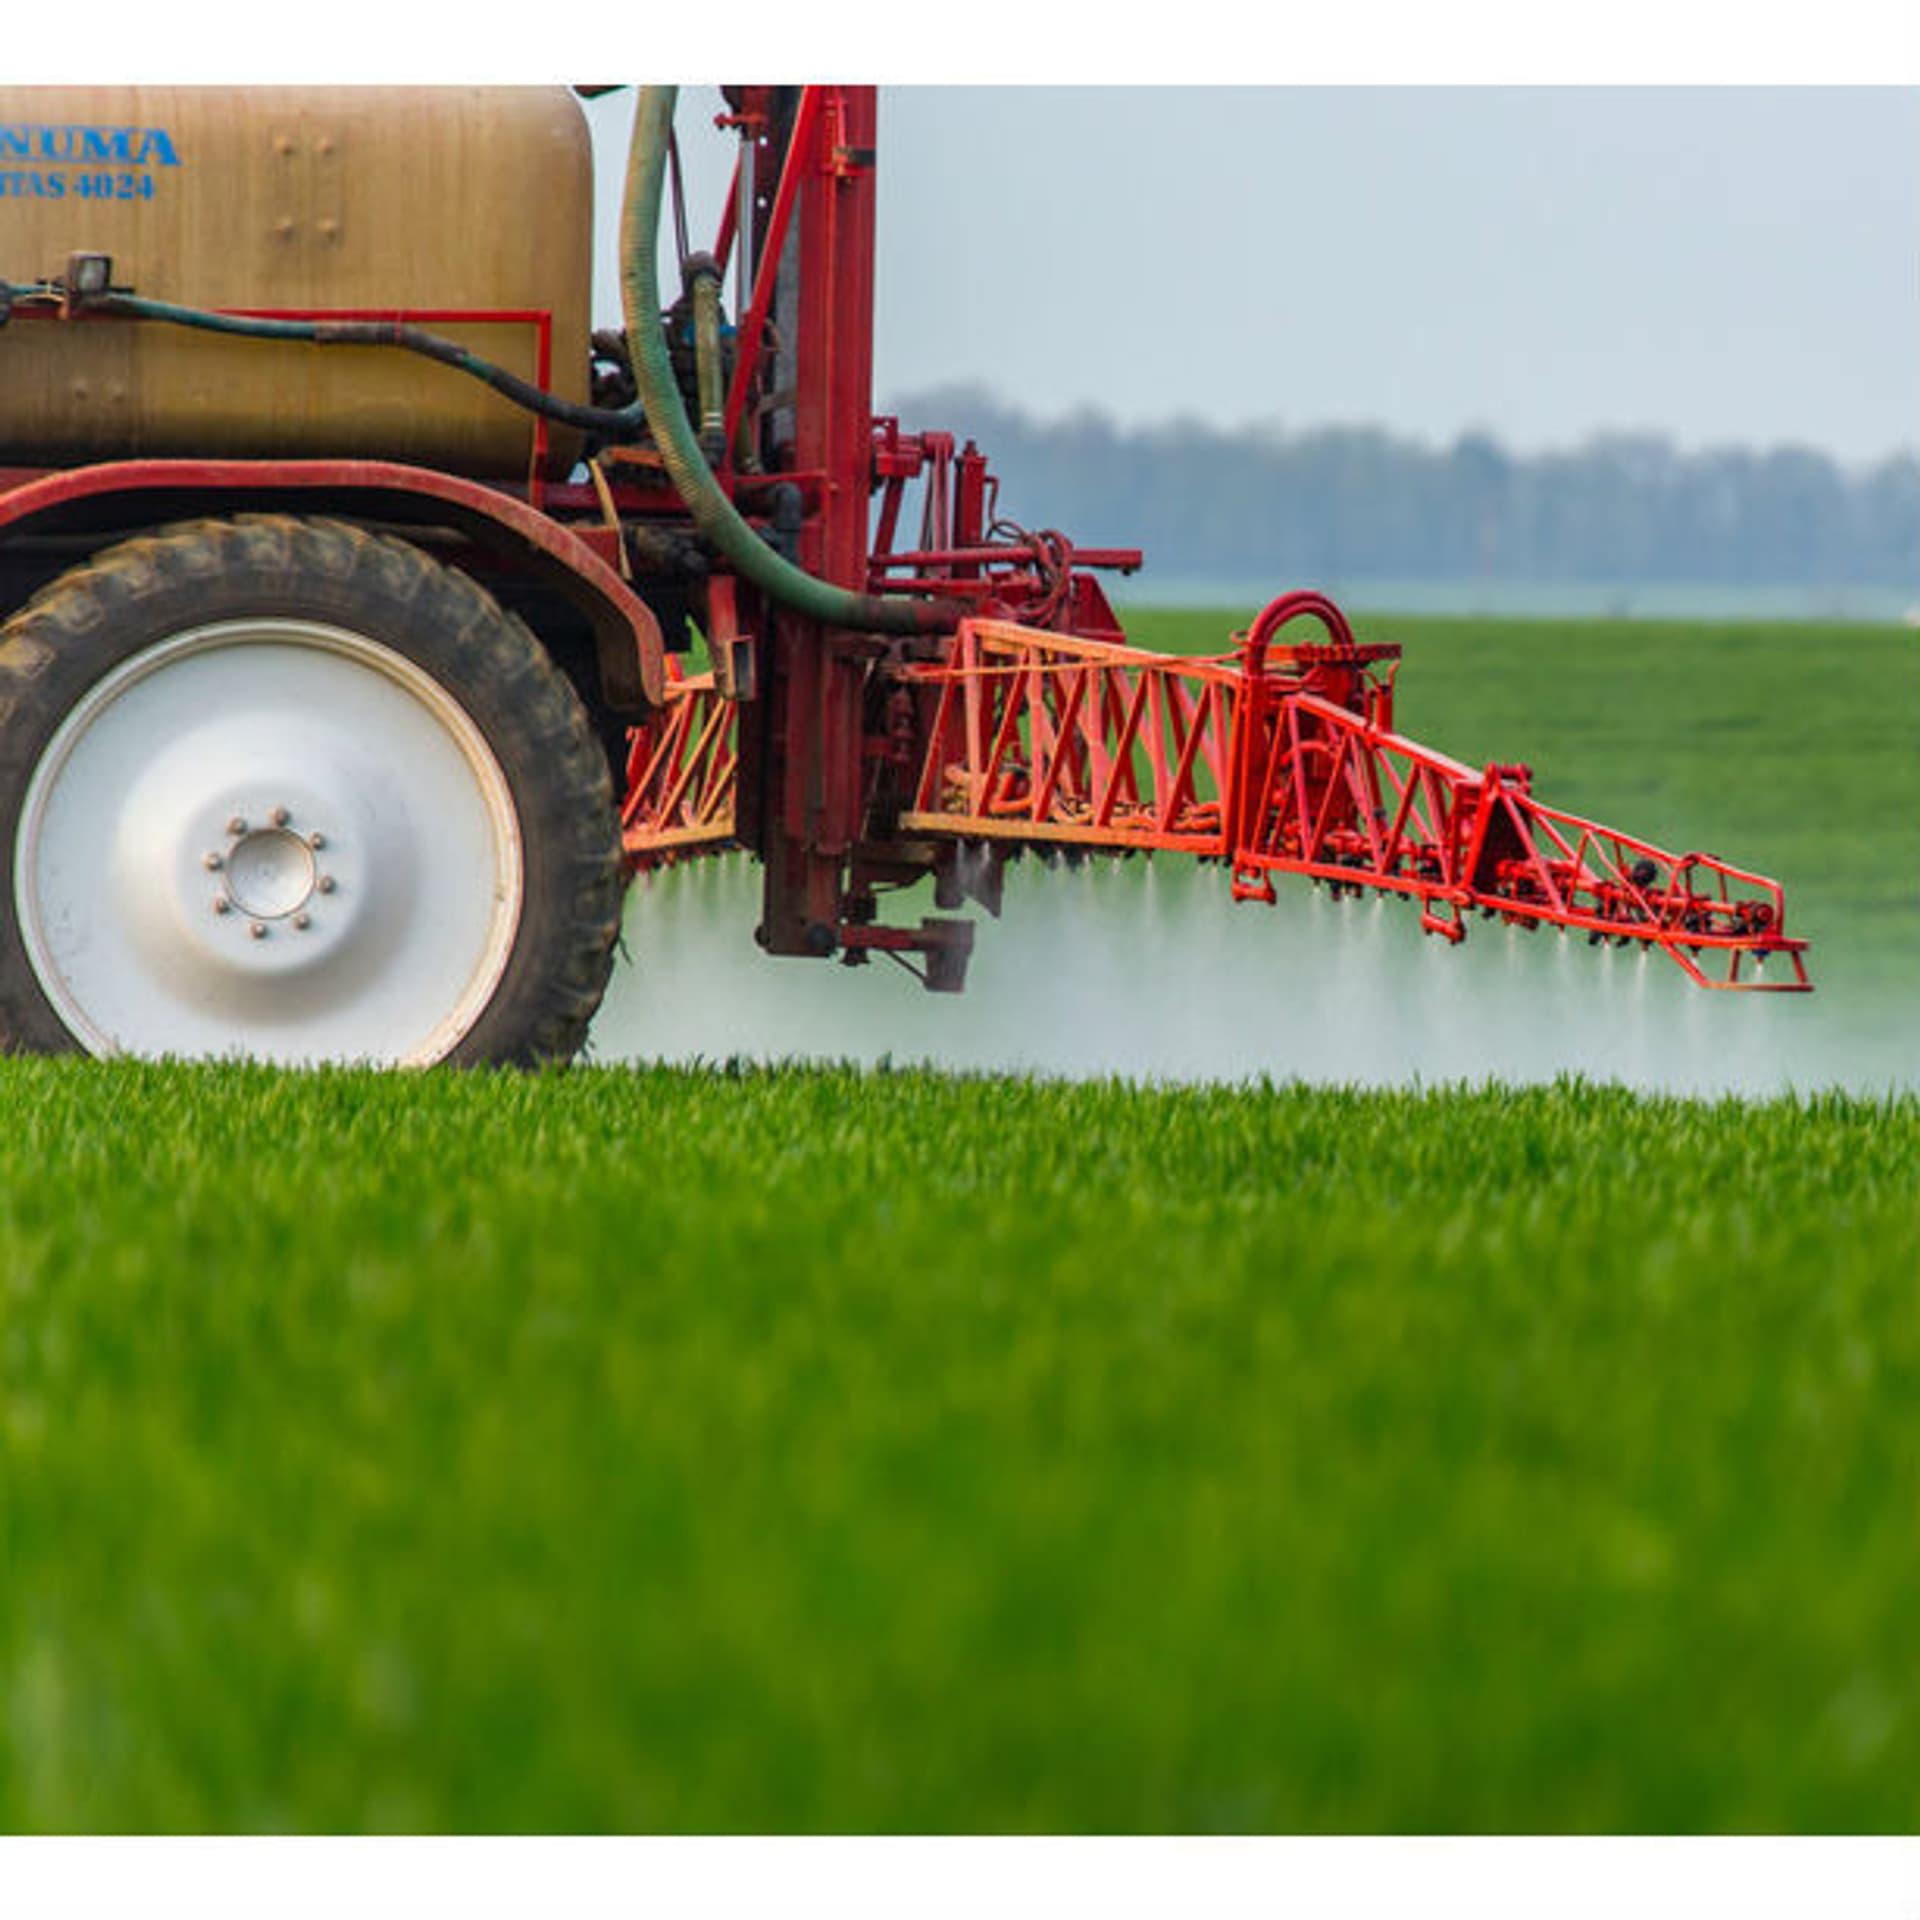 Pestizide Fotolia